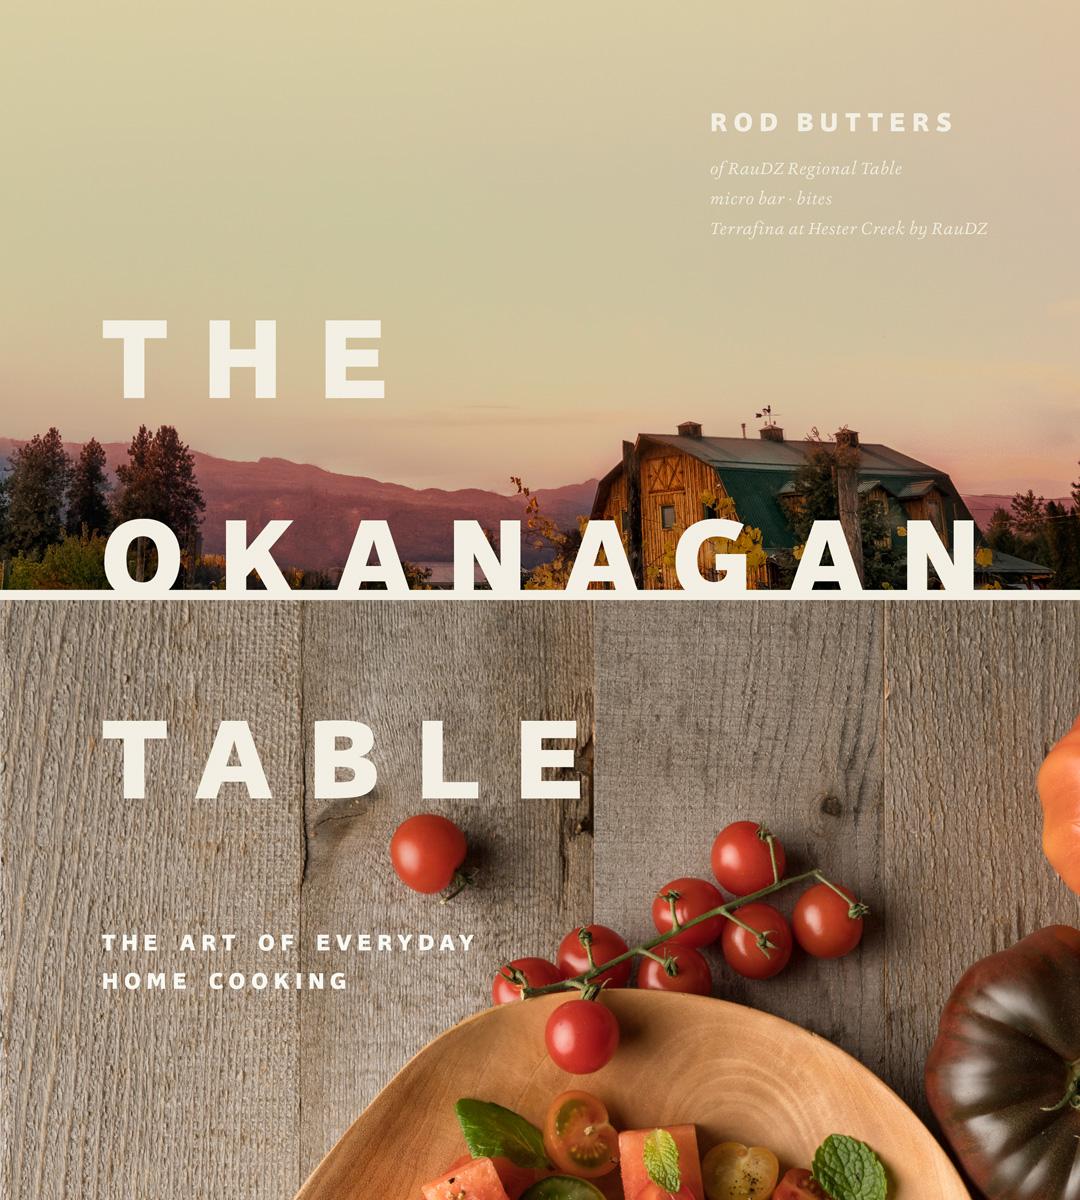 Okanagan Table, The